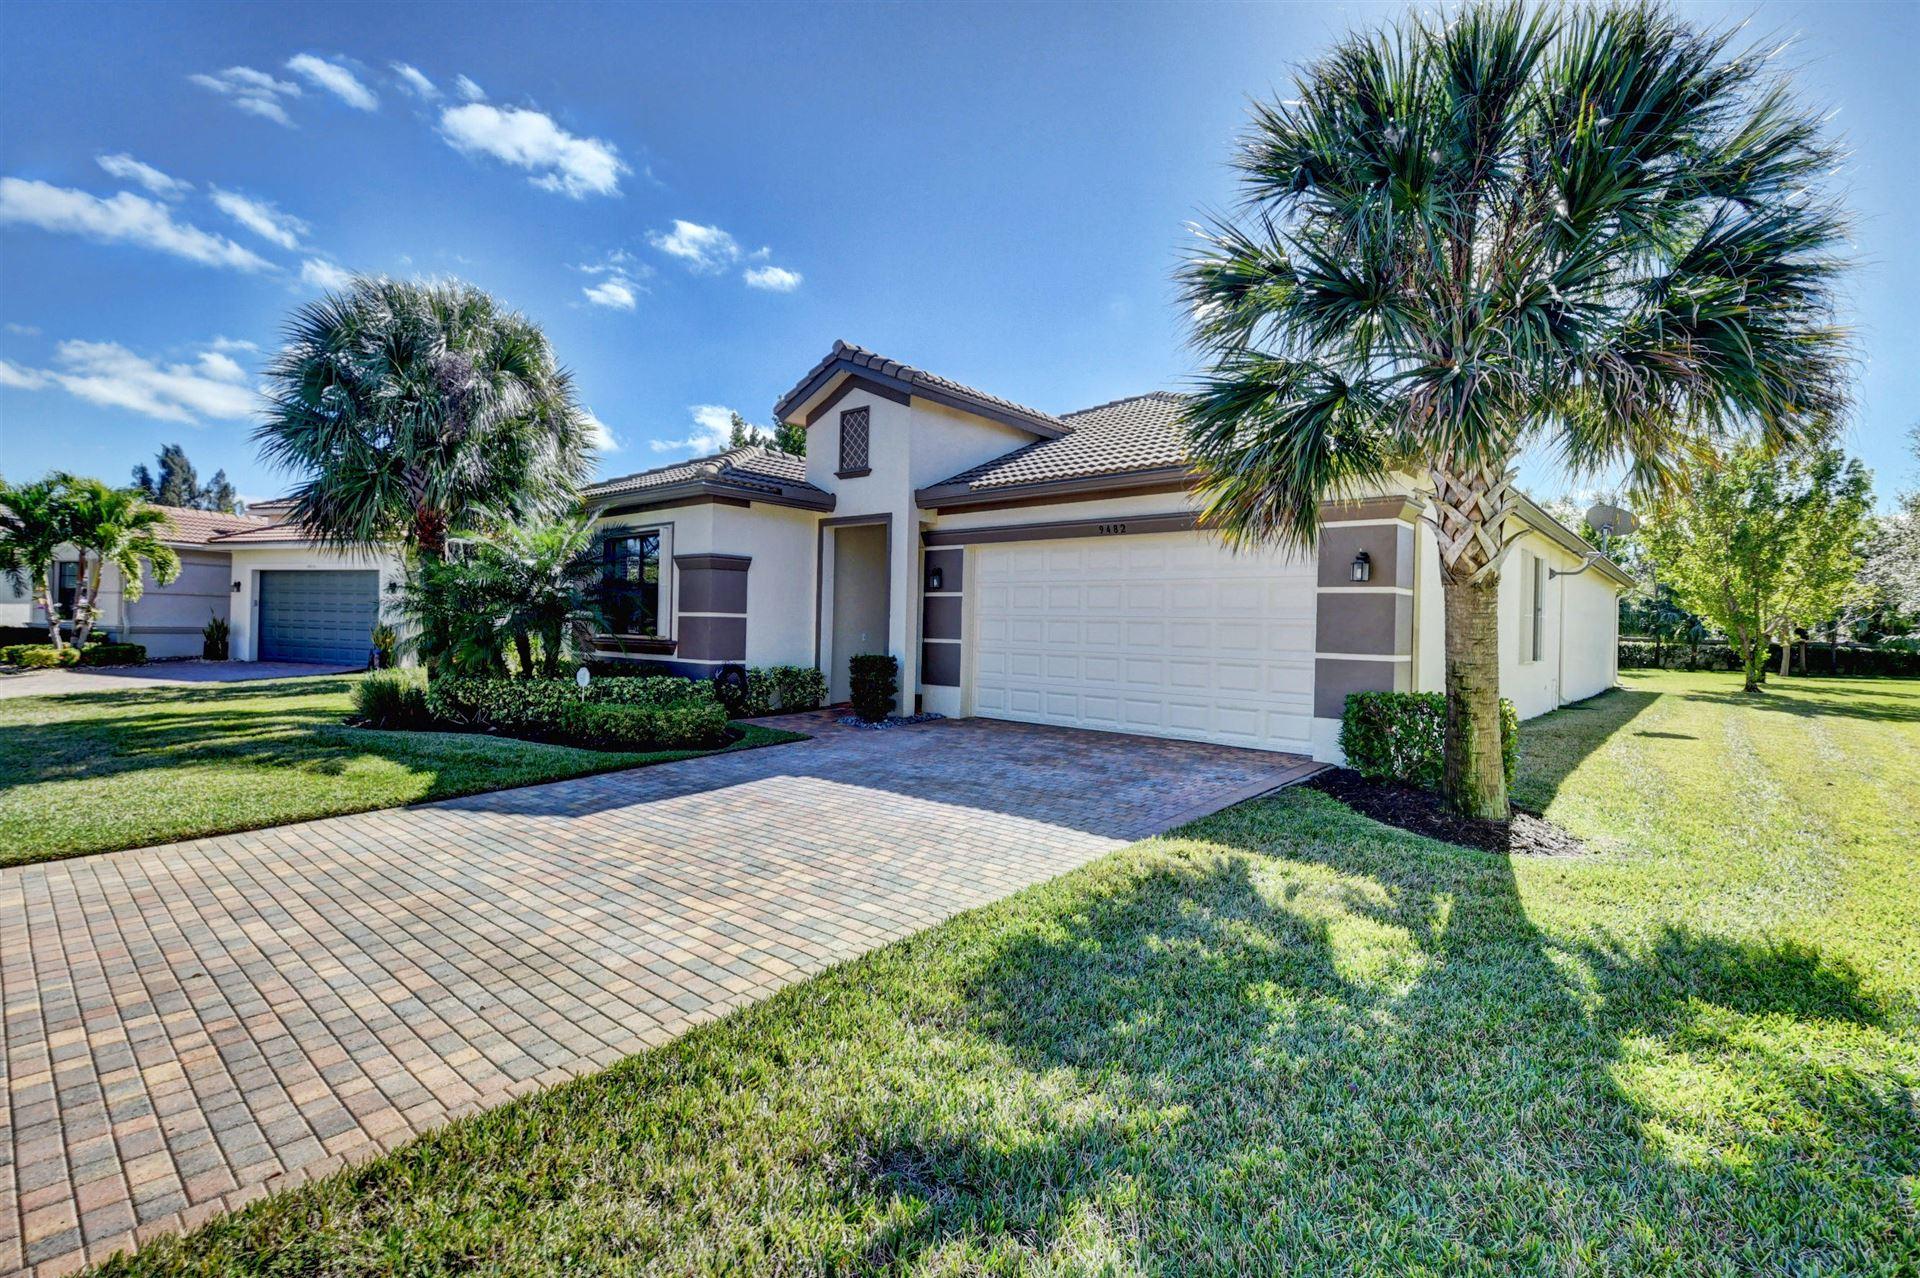 Photo of 9482 Isles Cay Drive, Delray Beach, FL 33446 (MLS # RX-10687050)